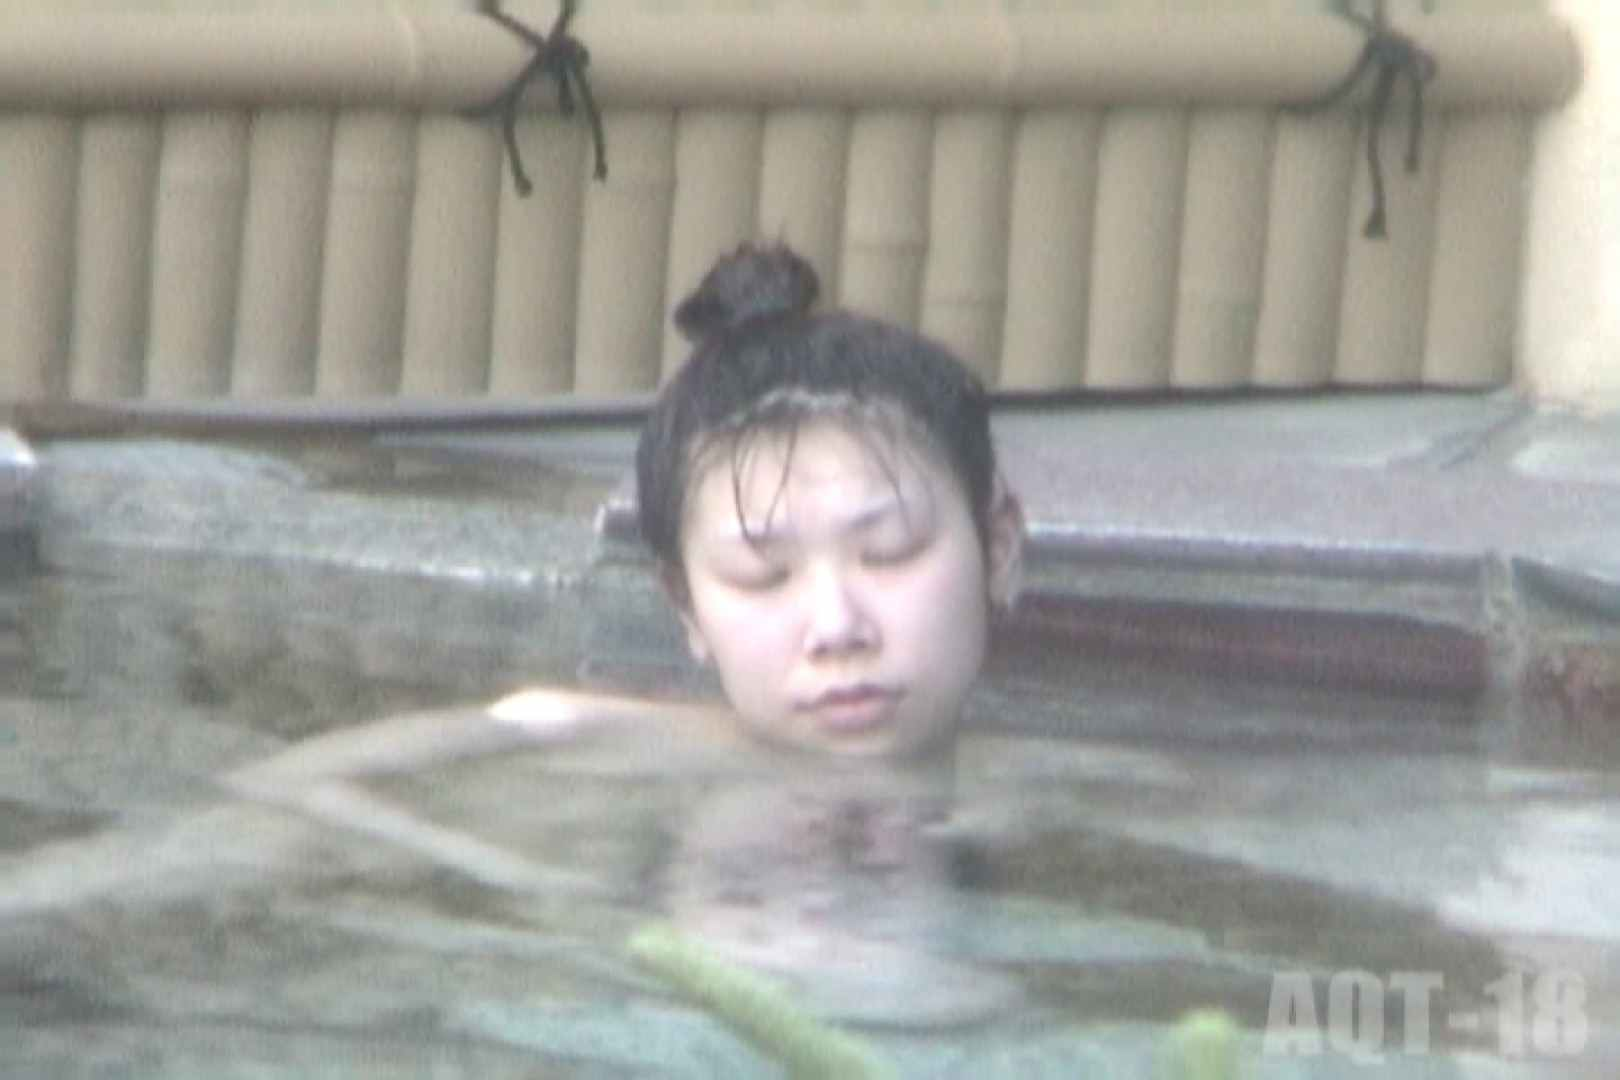 Aquaな露天風呂Vol.855 露天 おまんこ無修正動画無料 12pic 8